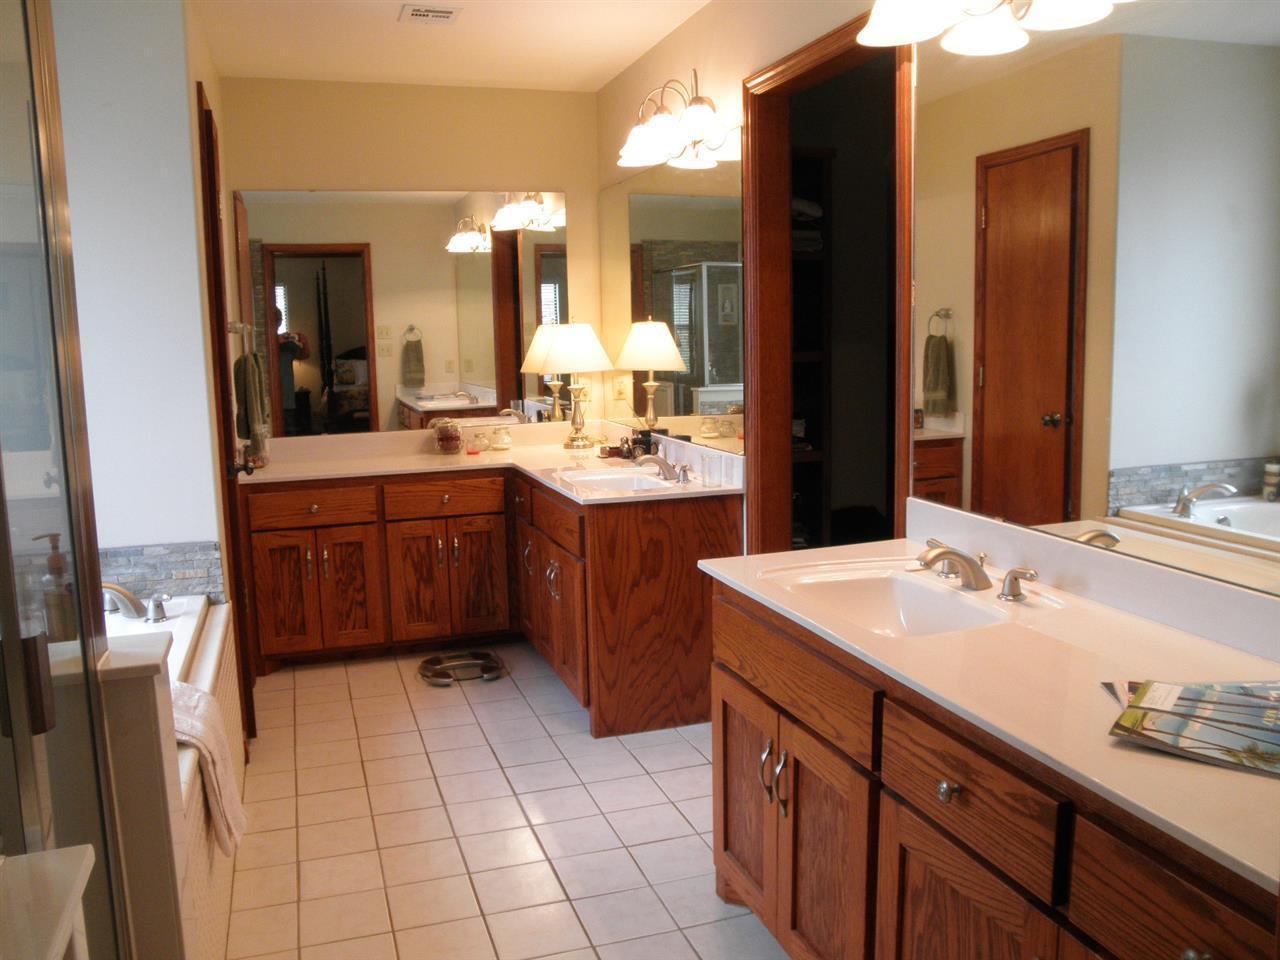 Sold Intraoffice W/MLS | 6855 Lake Road  Ponca City, OK 74604 17